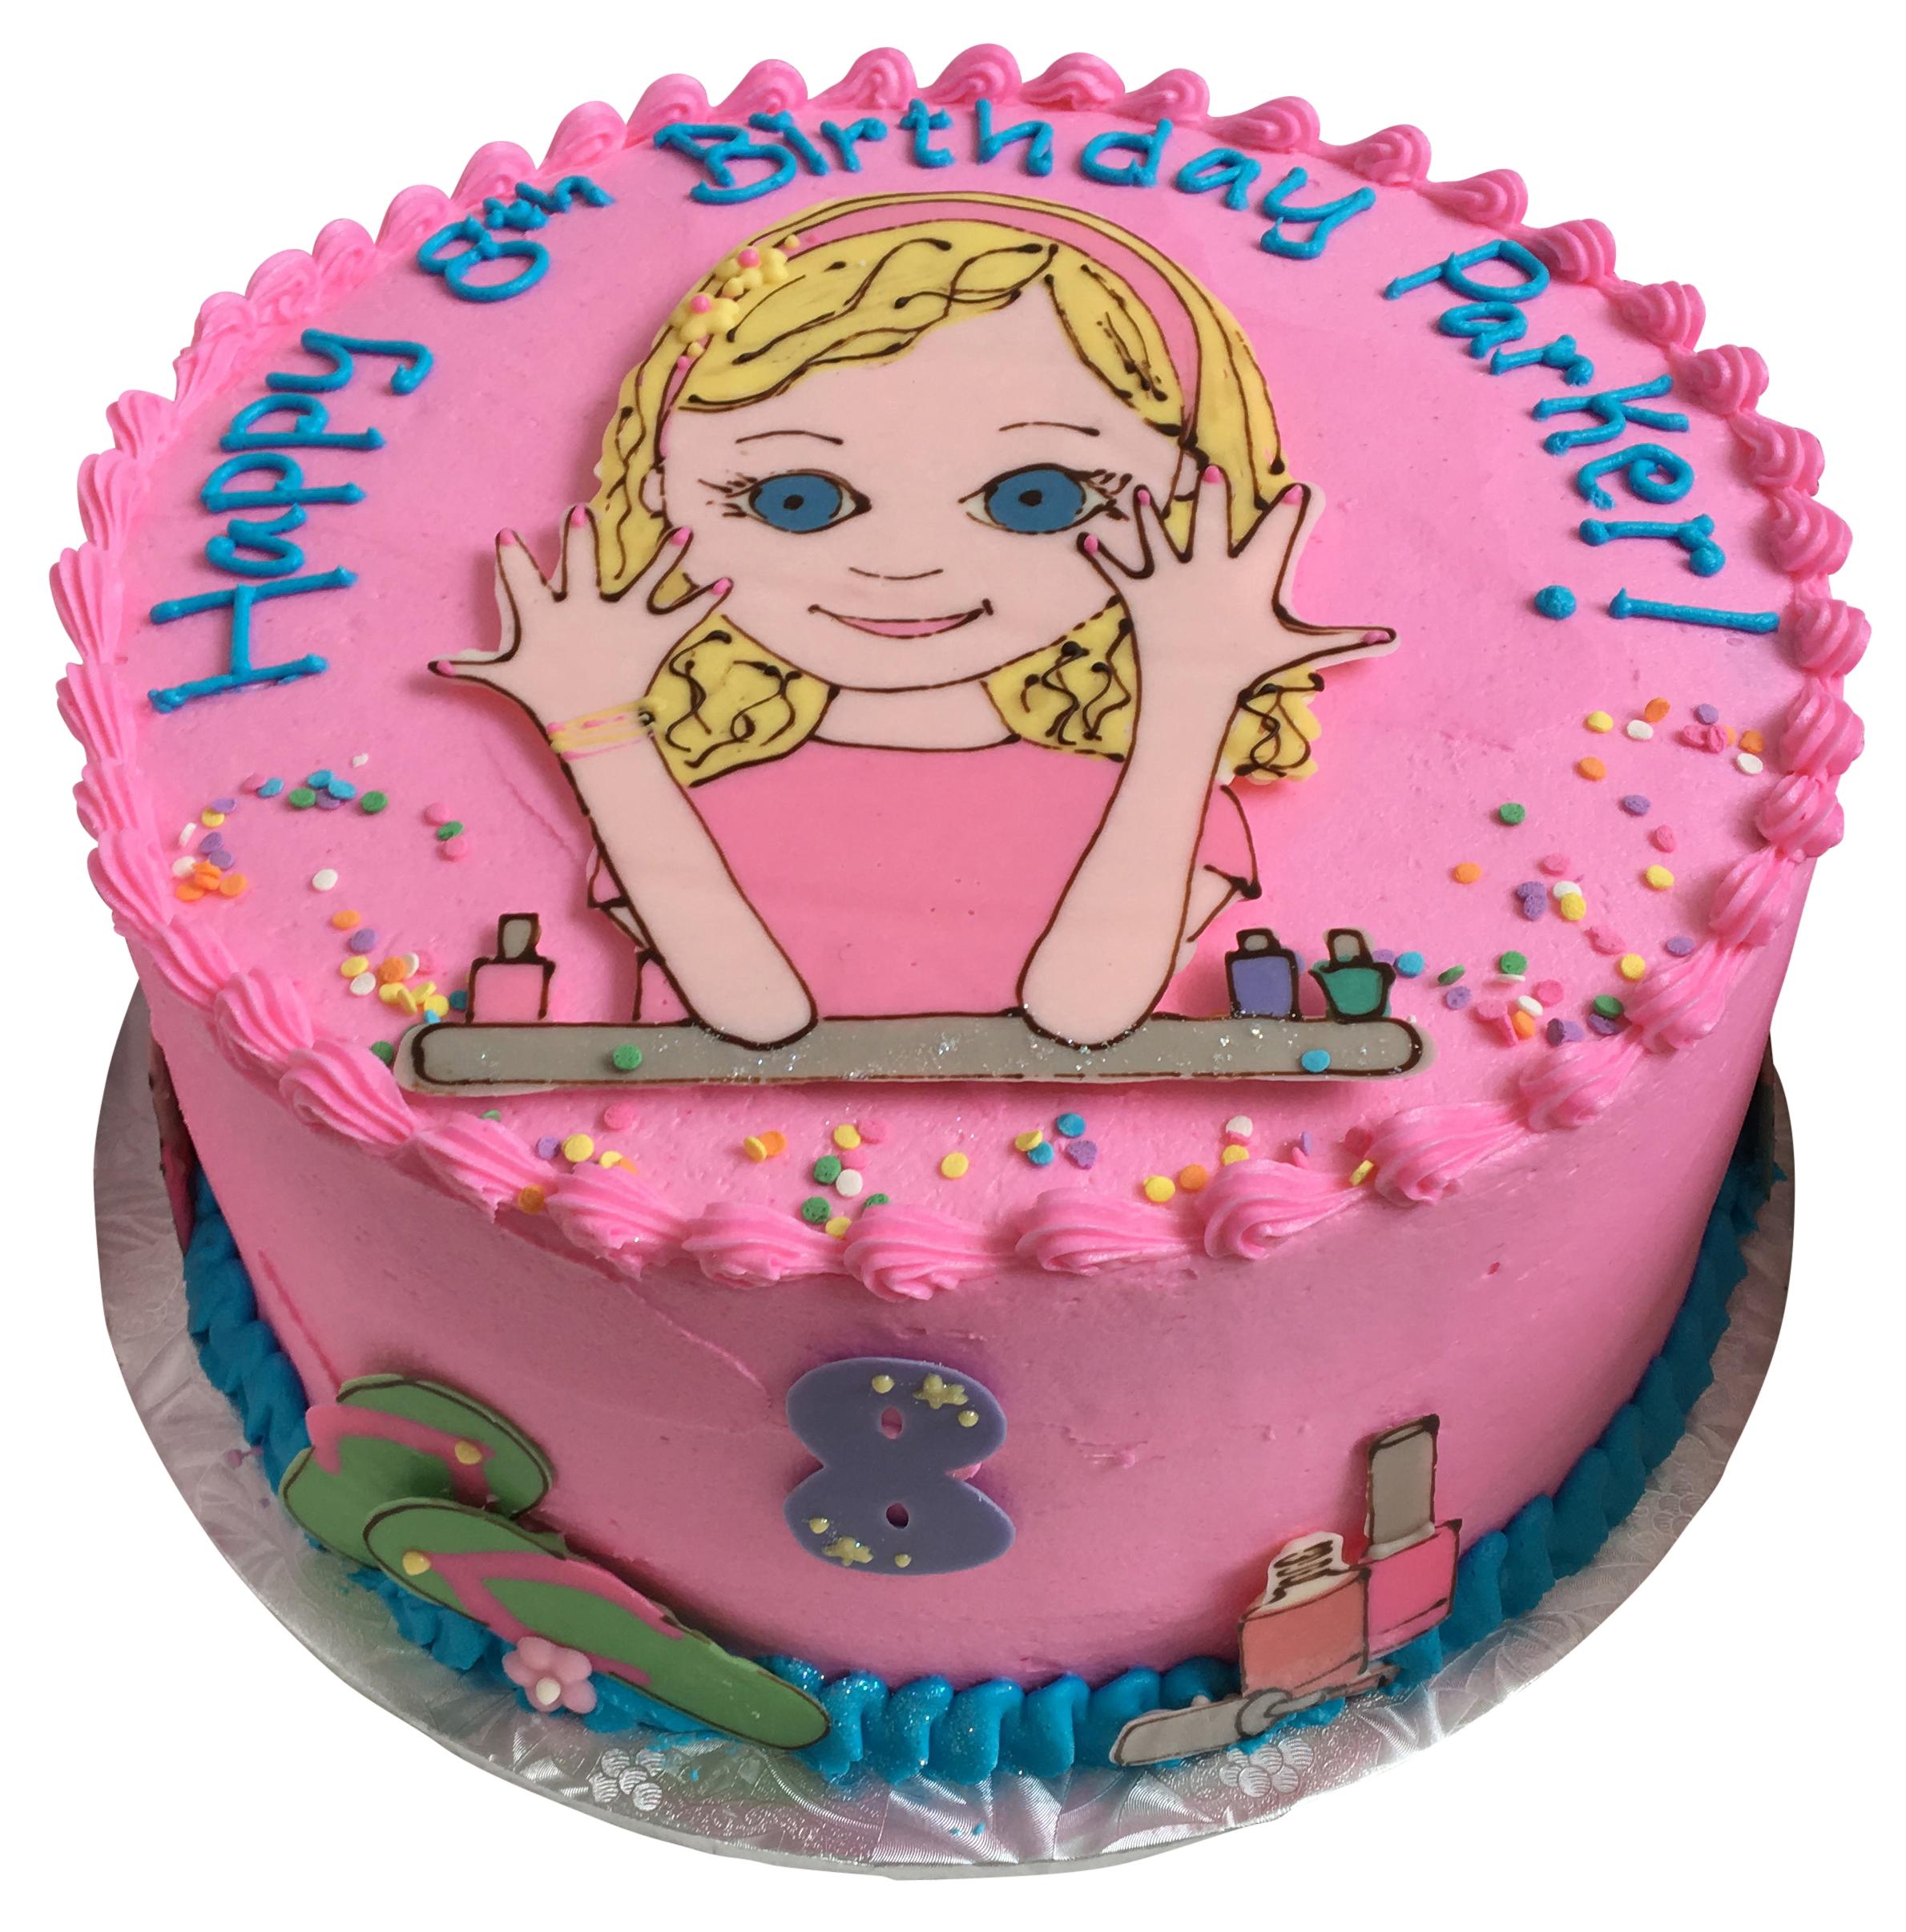 BeBe-Cakes-Spa-Nail-Salon-Cake.jpg